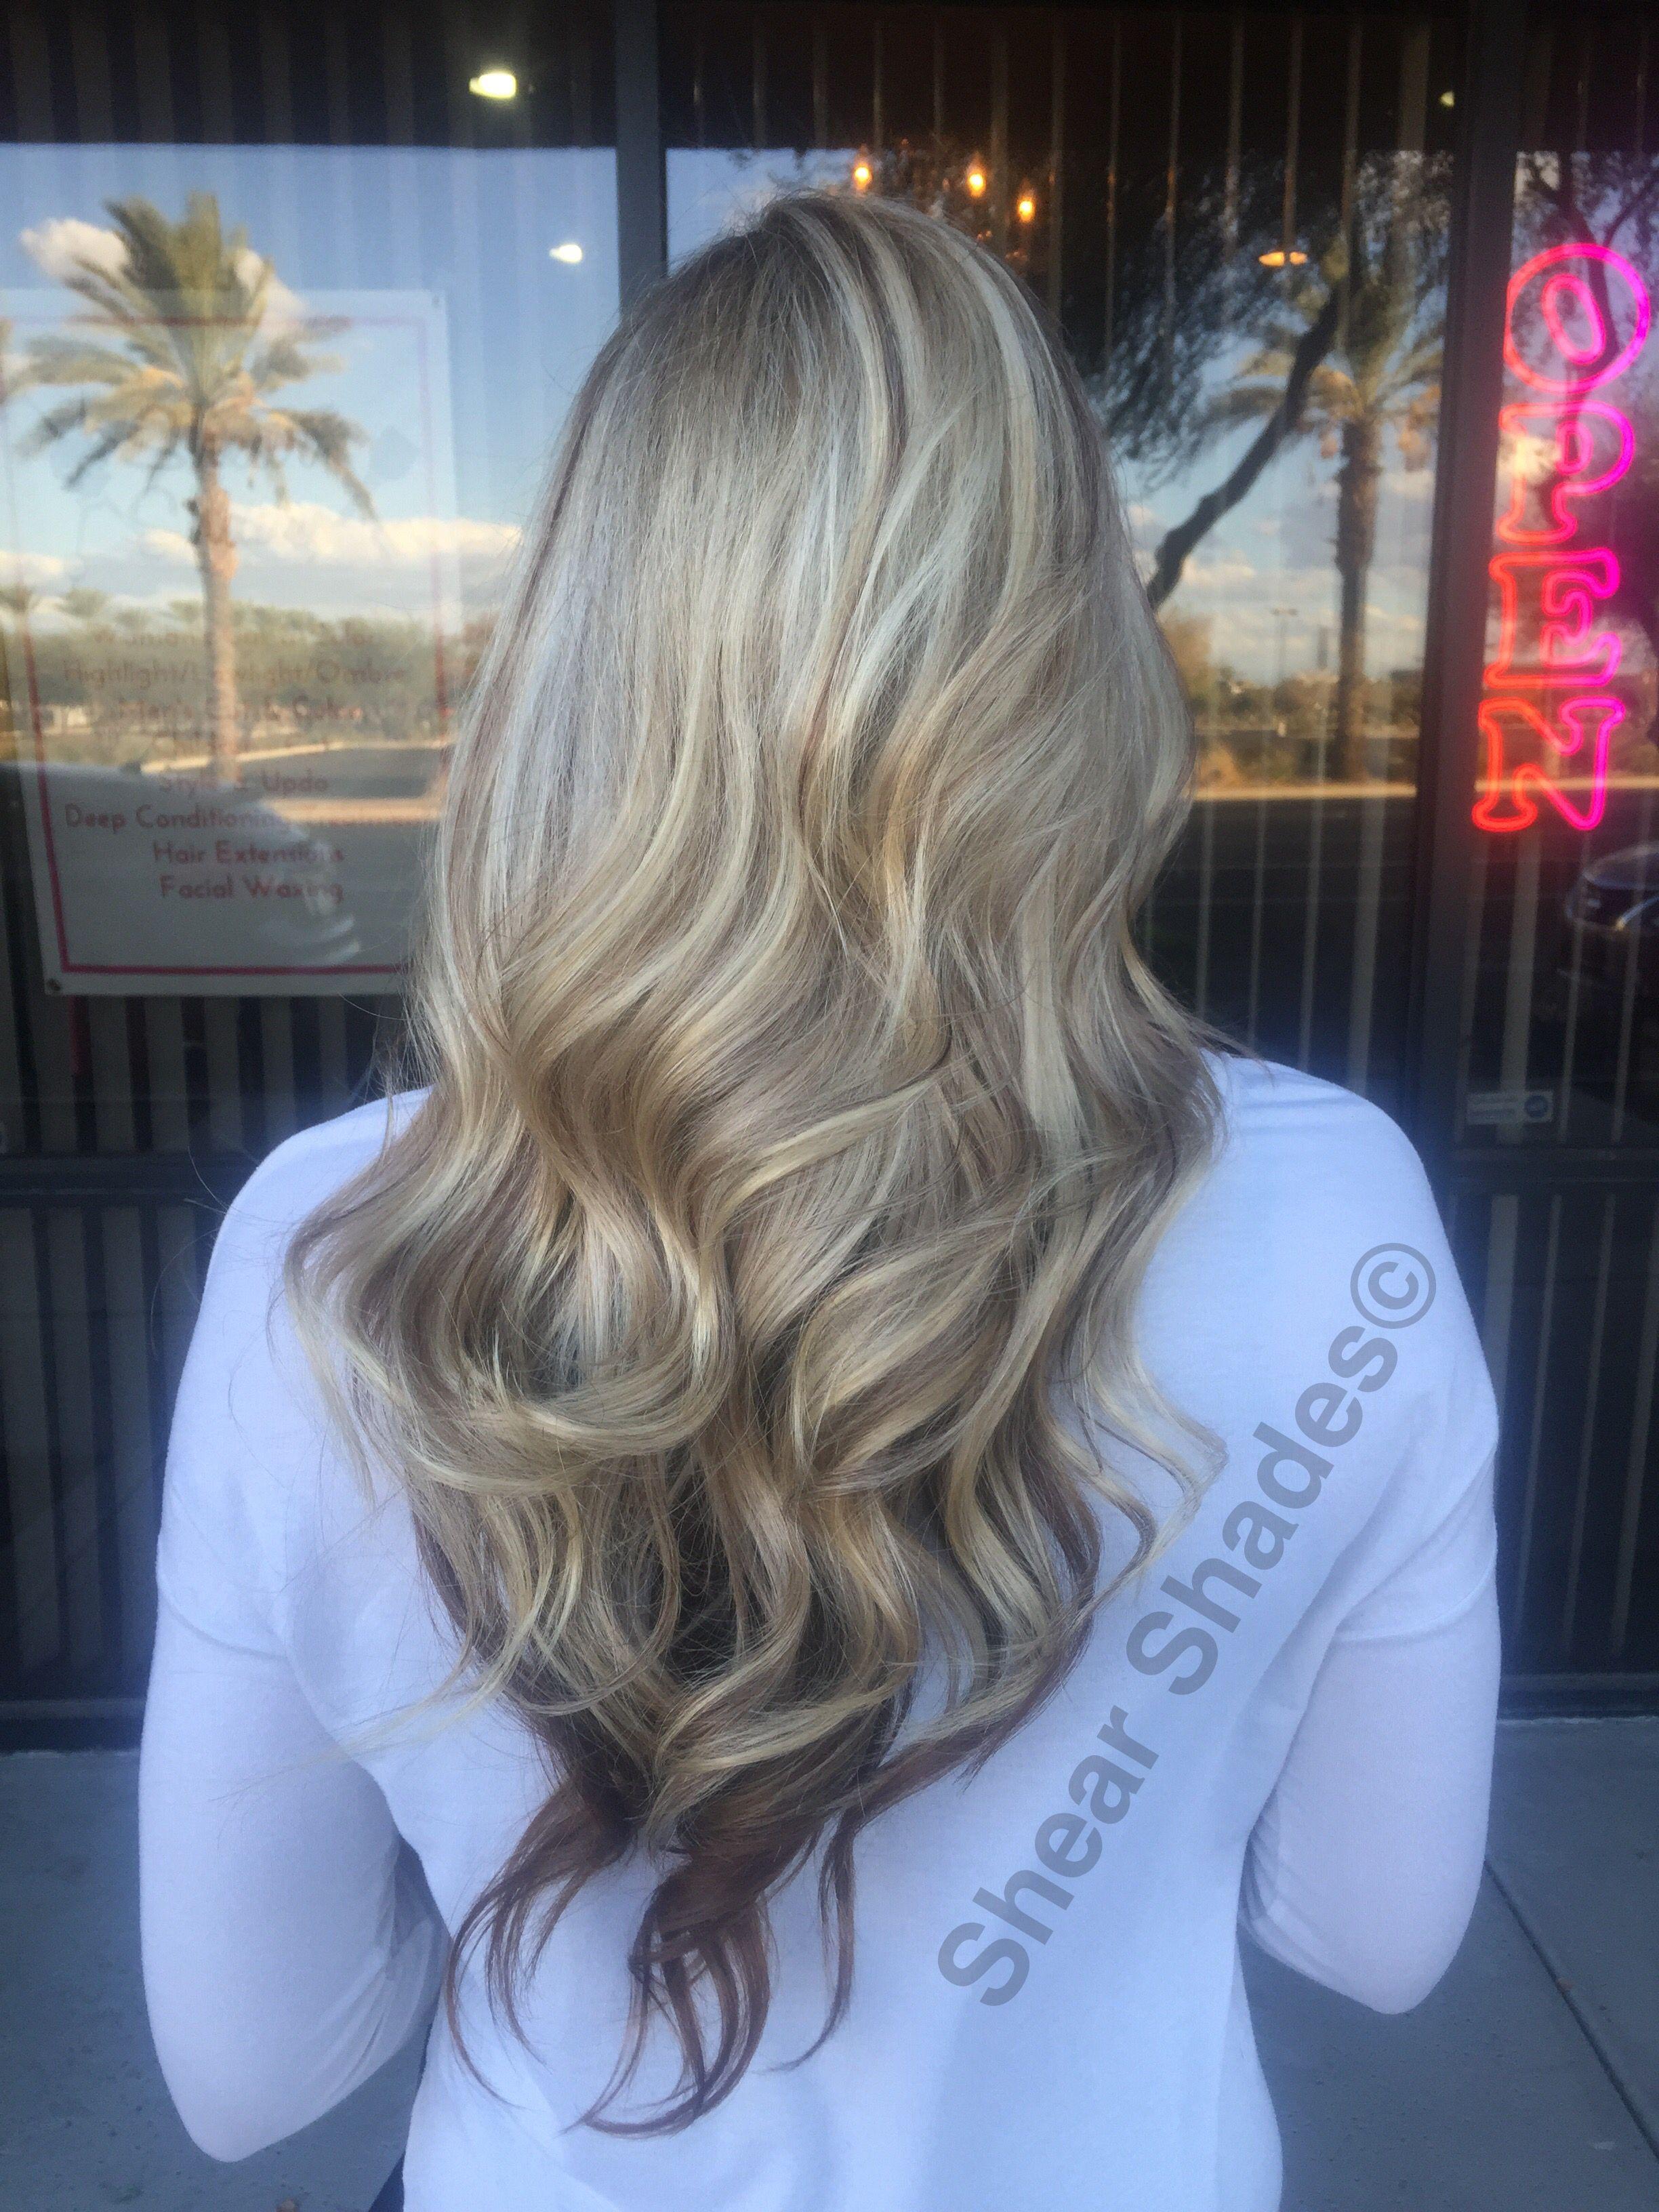 Chocolate blonde hair style on long hair. Platinum blonde hair ...